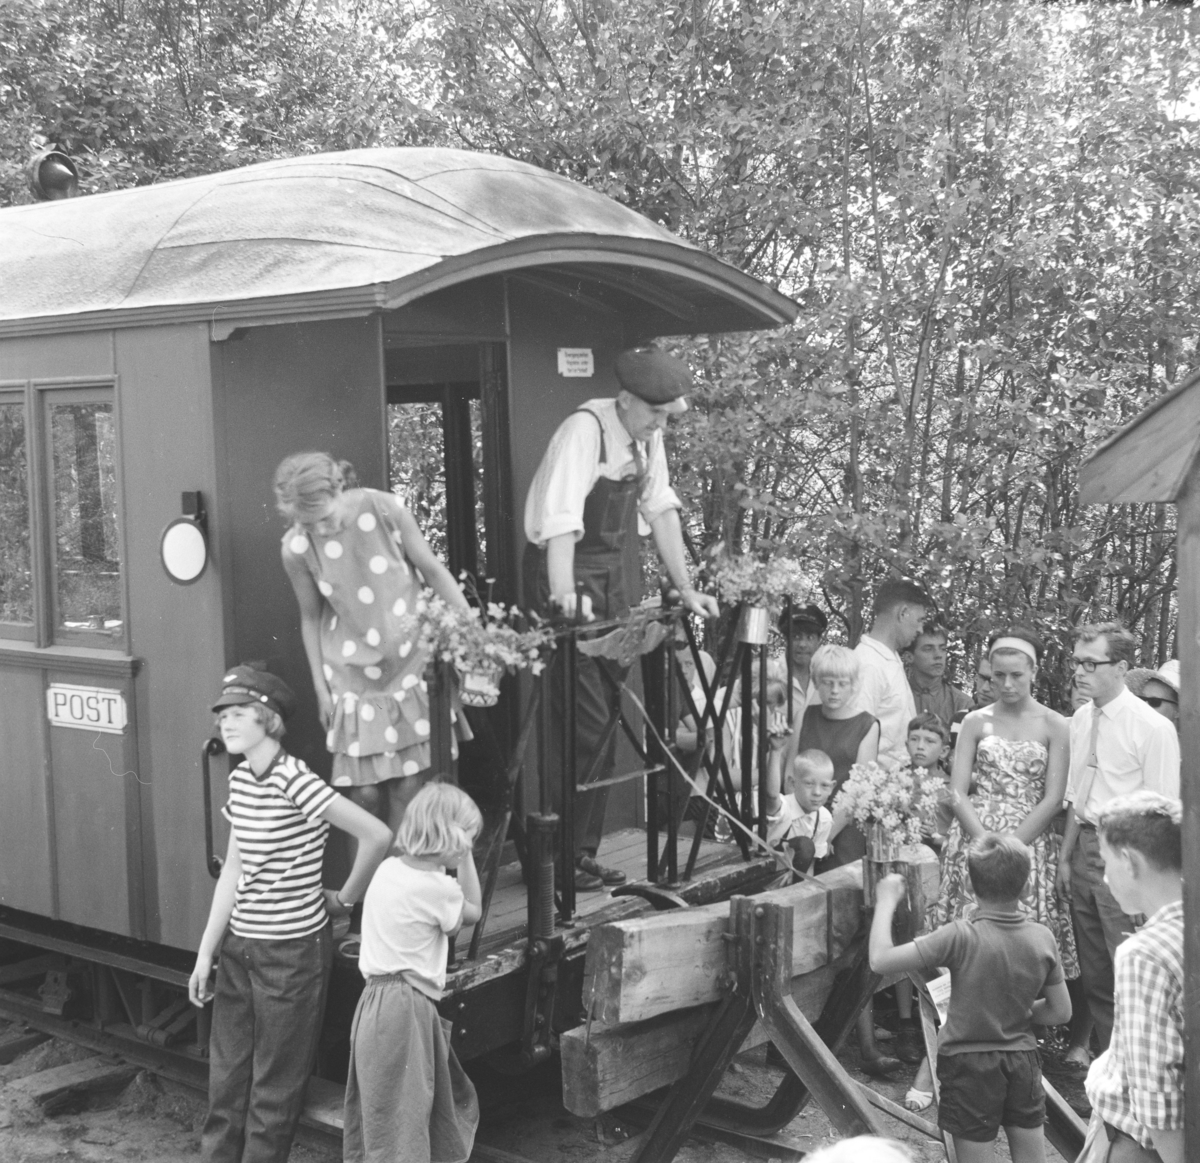 Åpning av museumsbanen 19. juni 1966. Margrethe Wiegels har klippet snoren. A/L Hølandsbanens formann Preben T. Hysing holder tale.